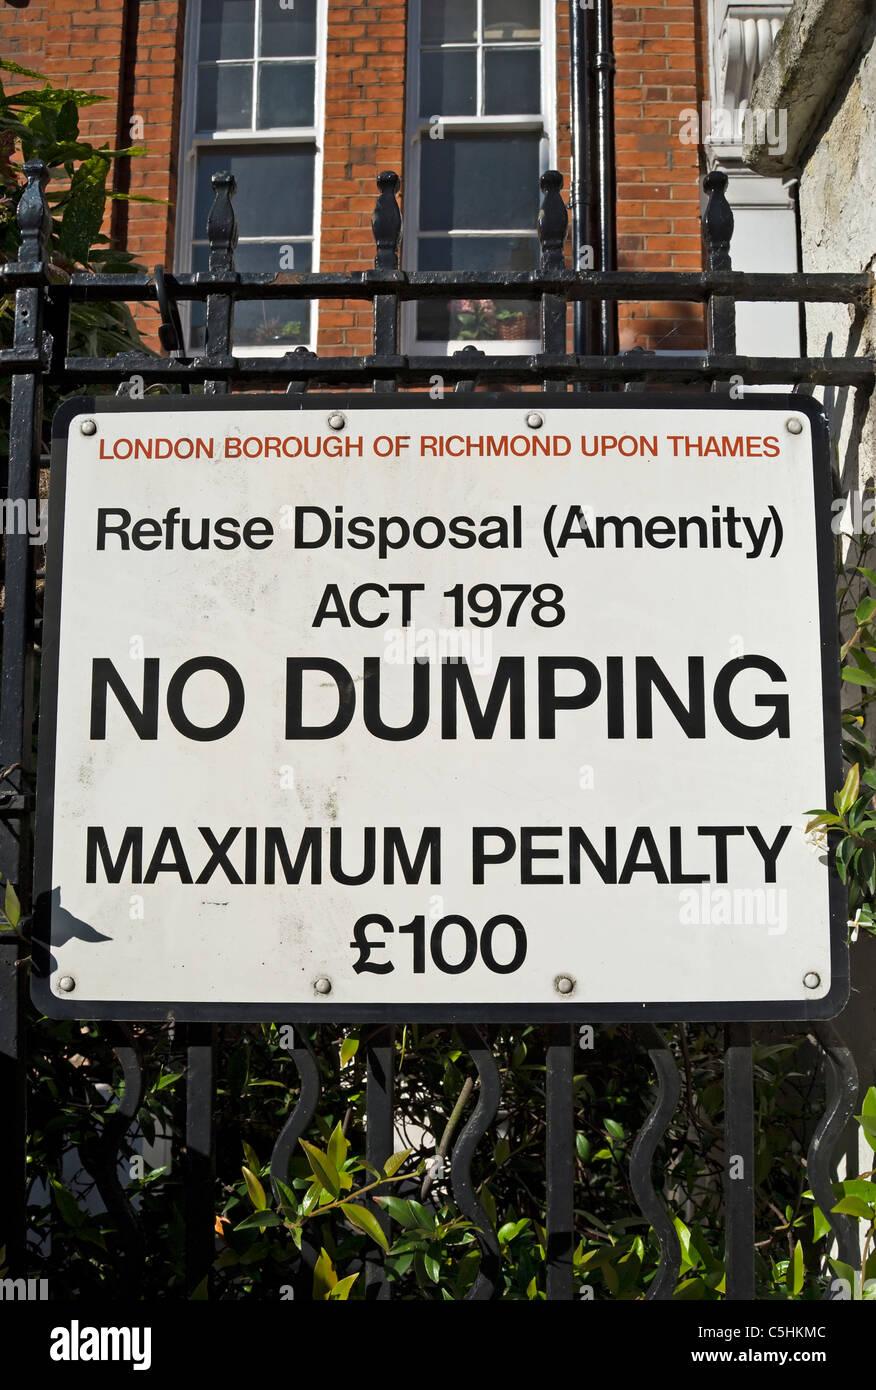 london borough of richmond upon thames no dumping notice , warning of £100 maximum penalty - Stock Image